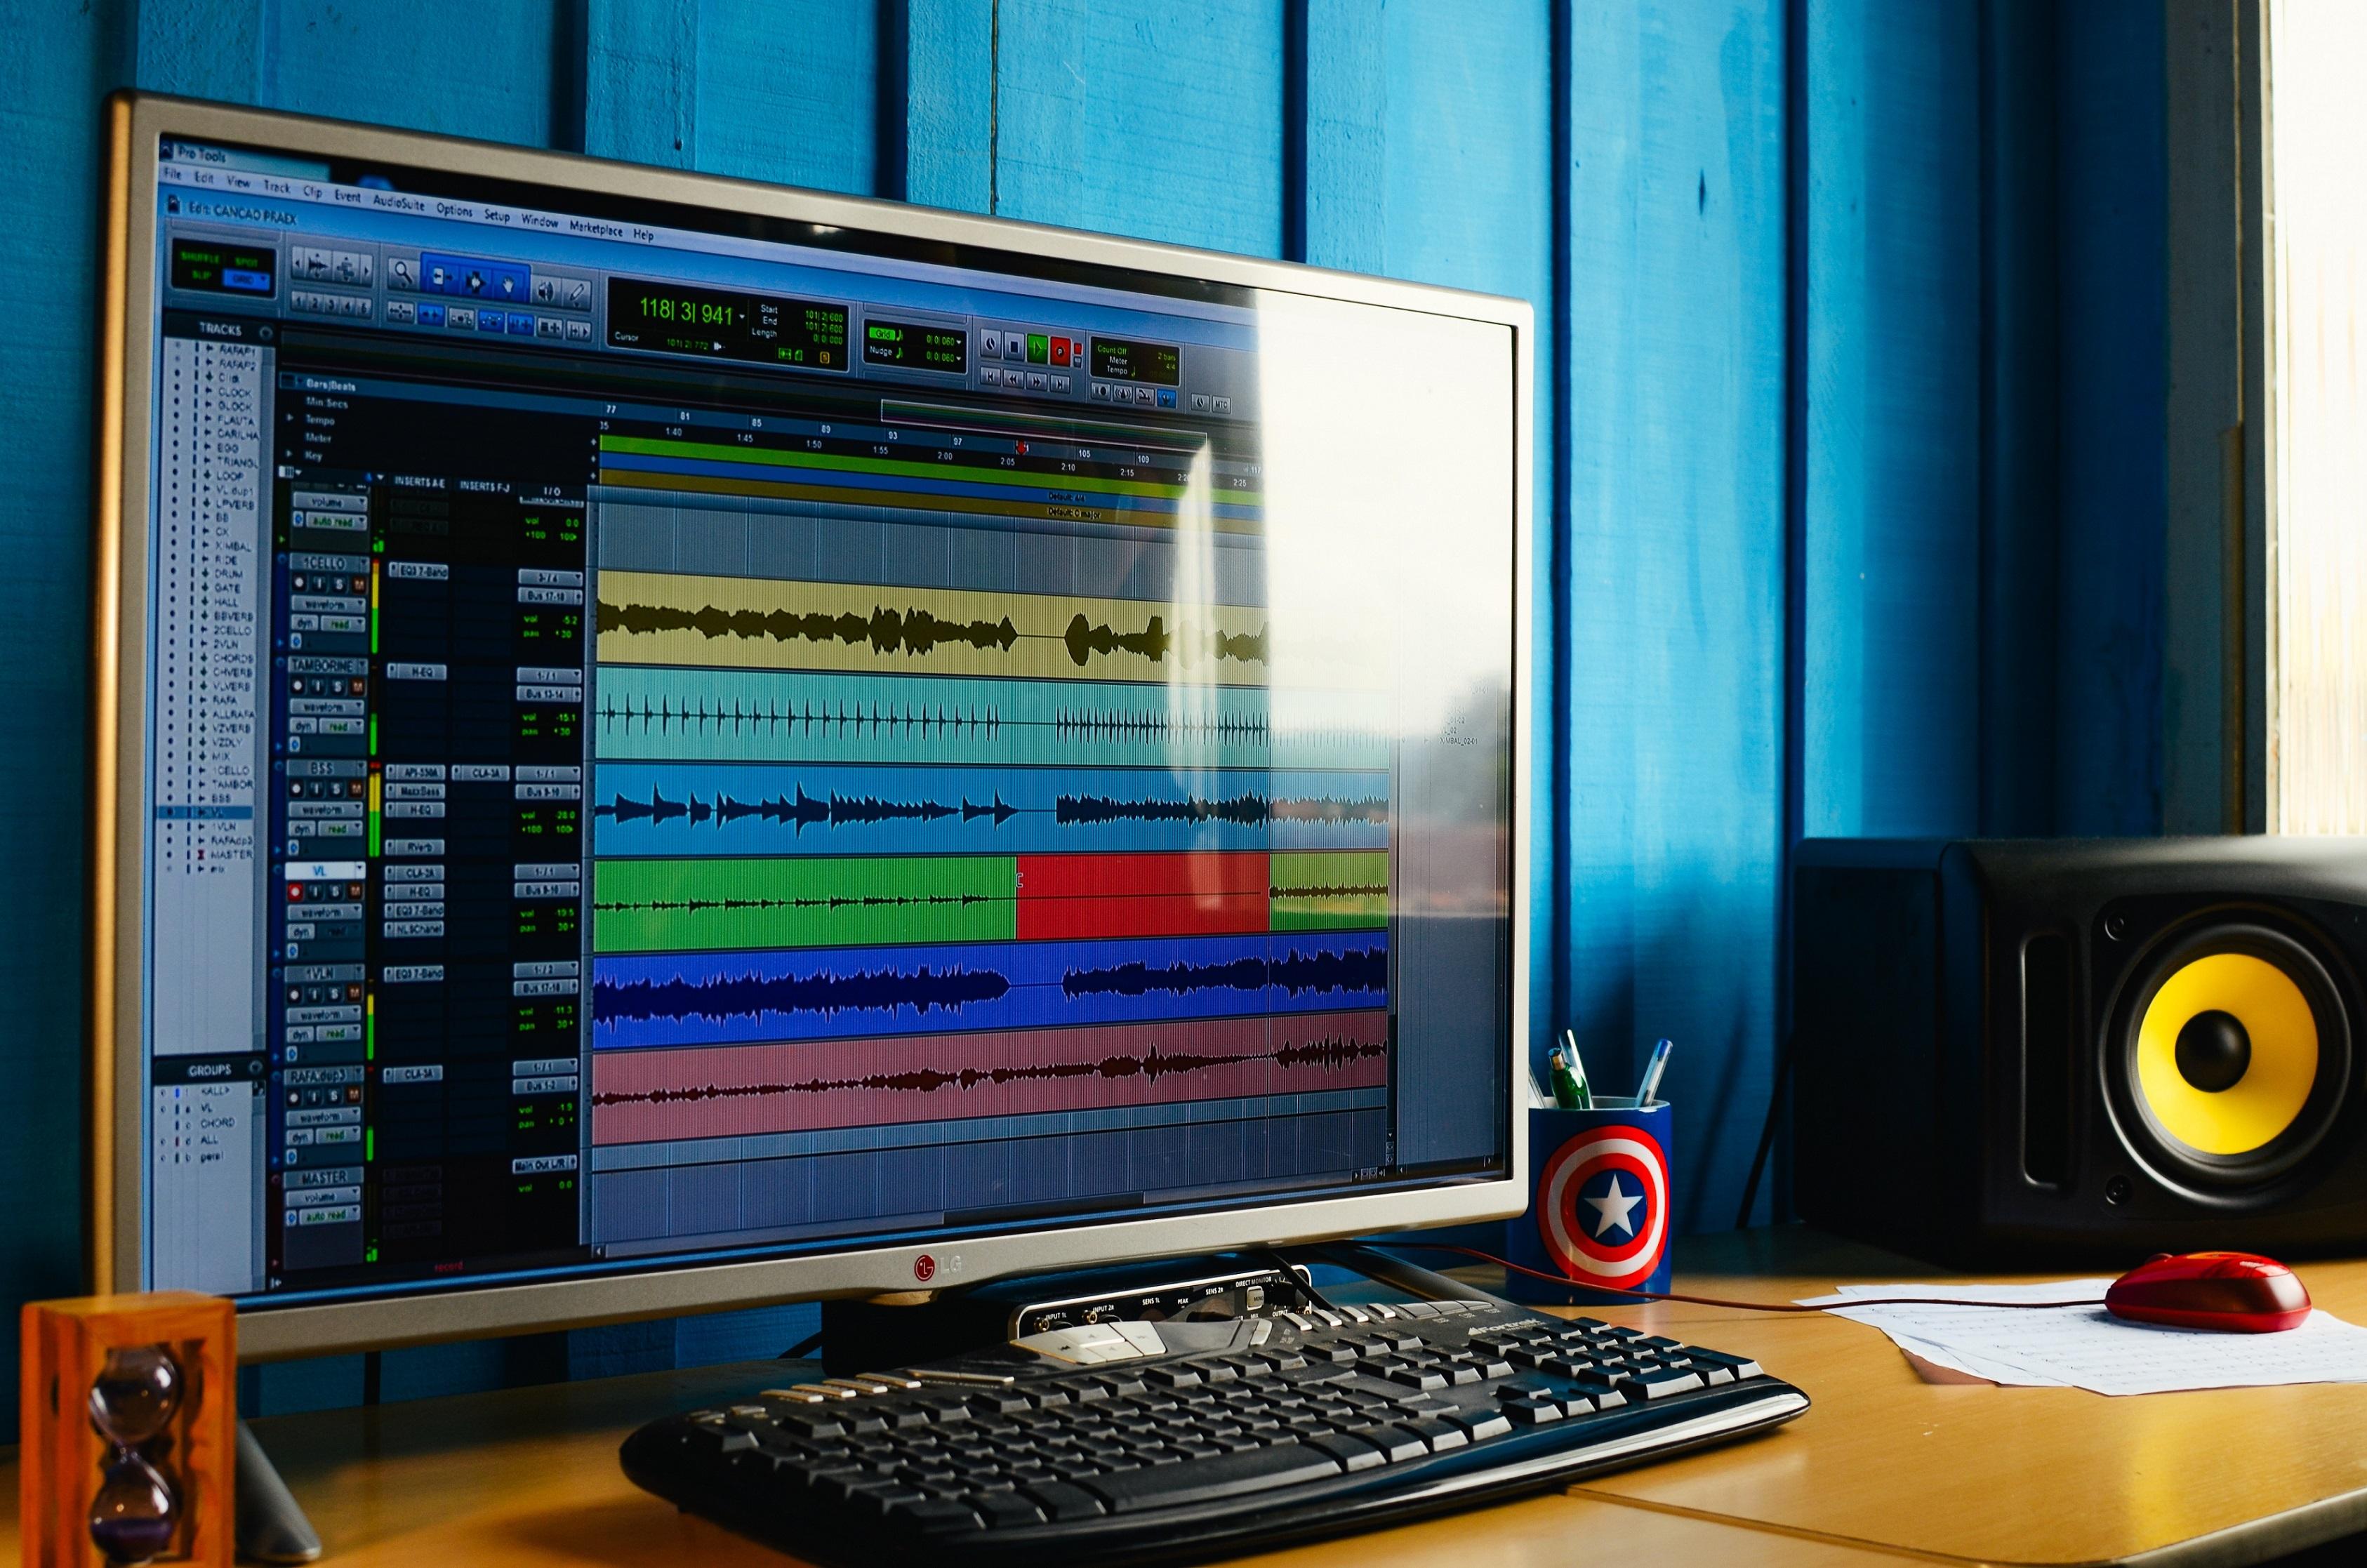 free images music technology studio sound mixing multimedia screenshot estudio audio. Black Bedroom Furniture Sets. Home Design Ideas